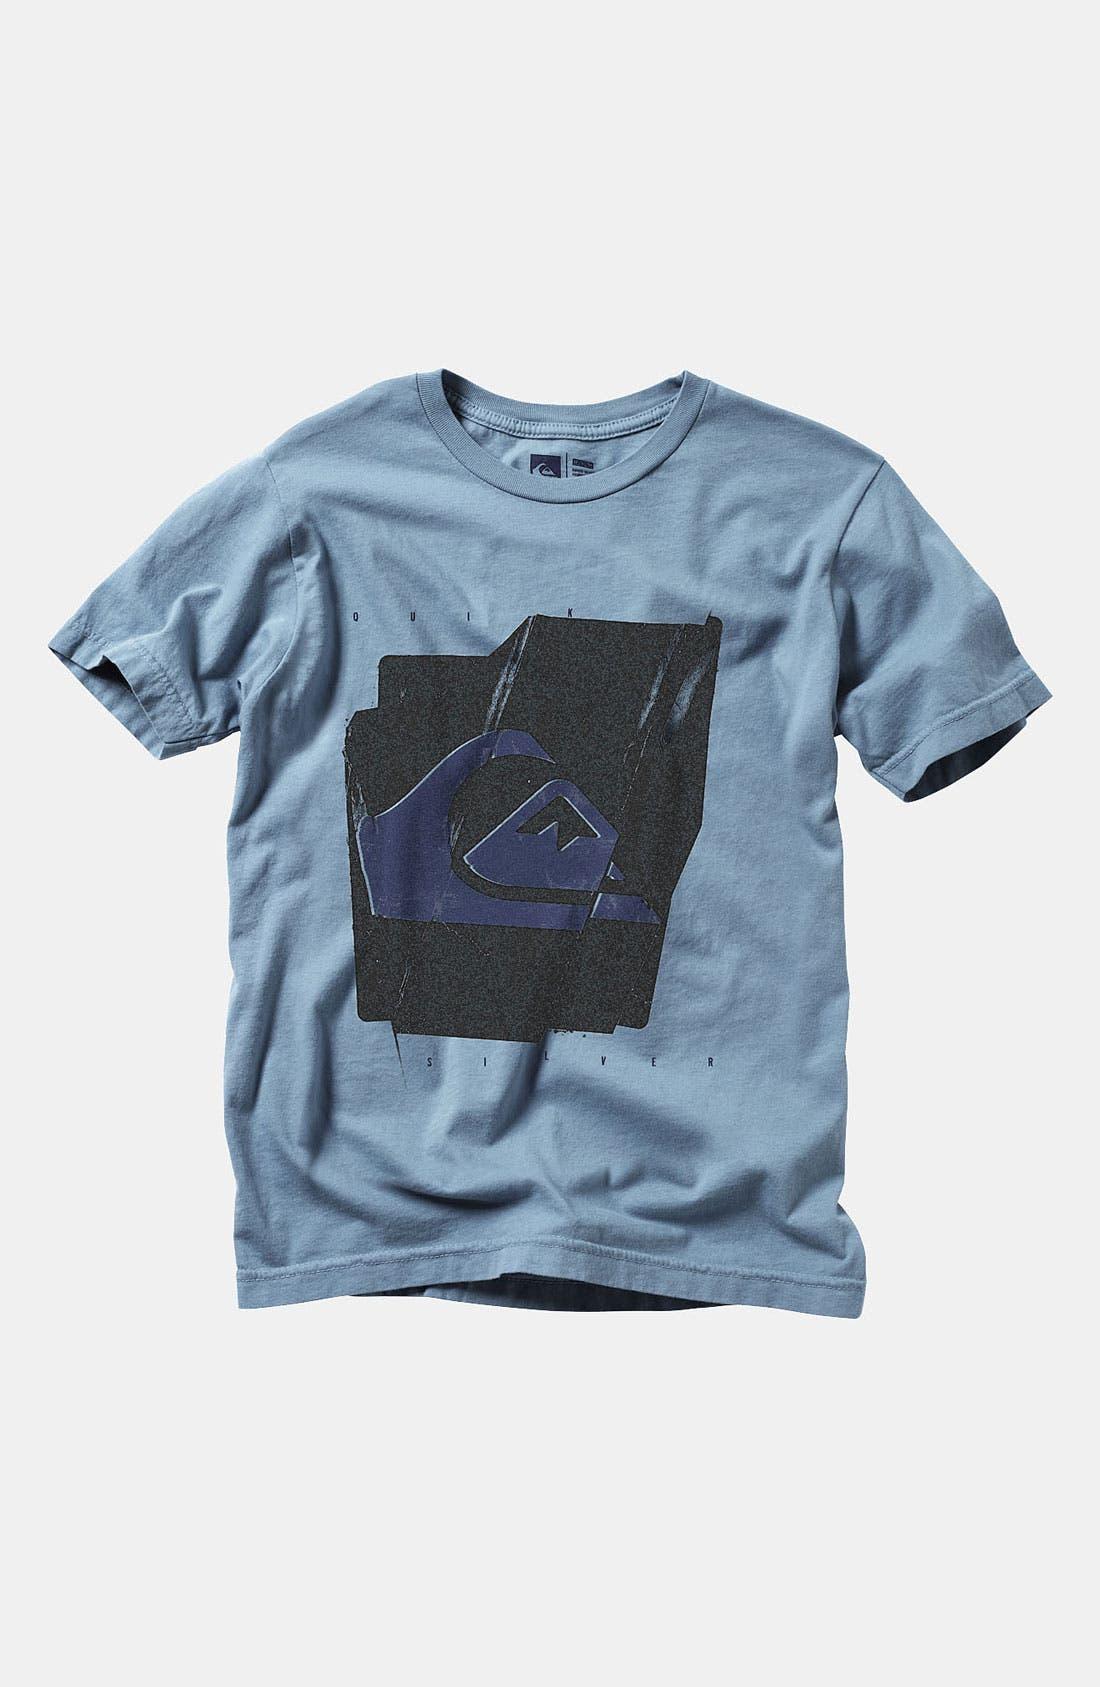 Main Image - Quiksilver 'Disregard' T-Shirt (Big Boys)